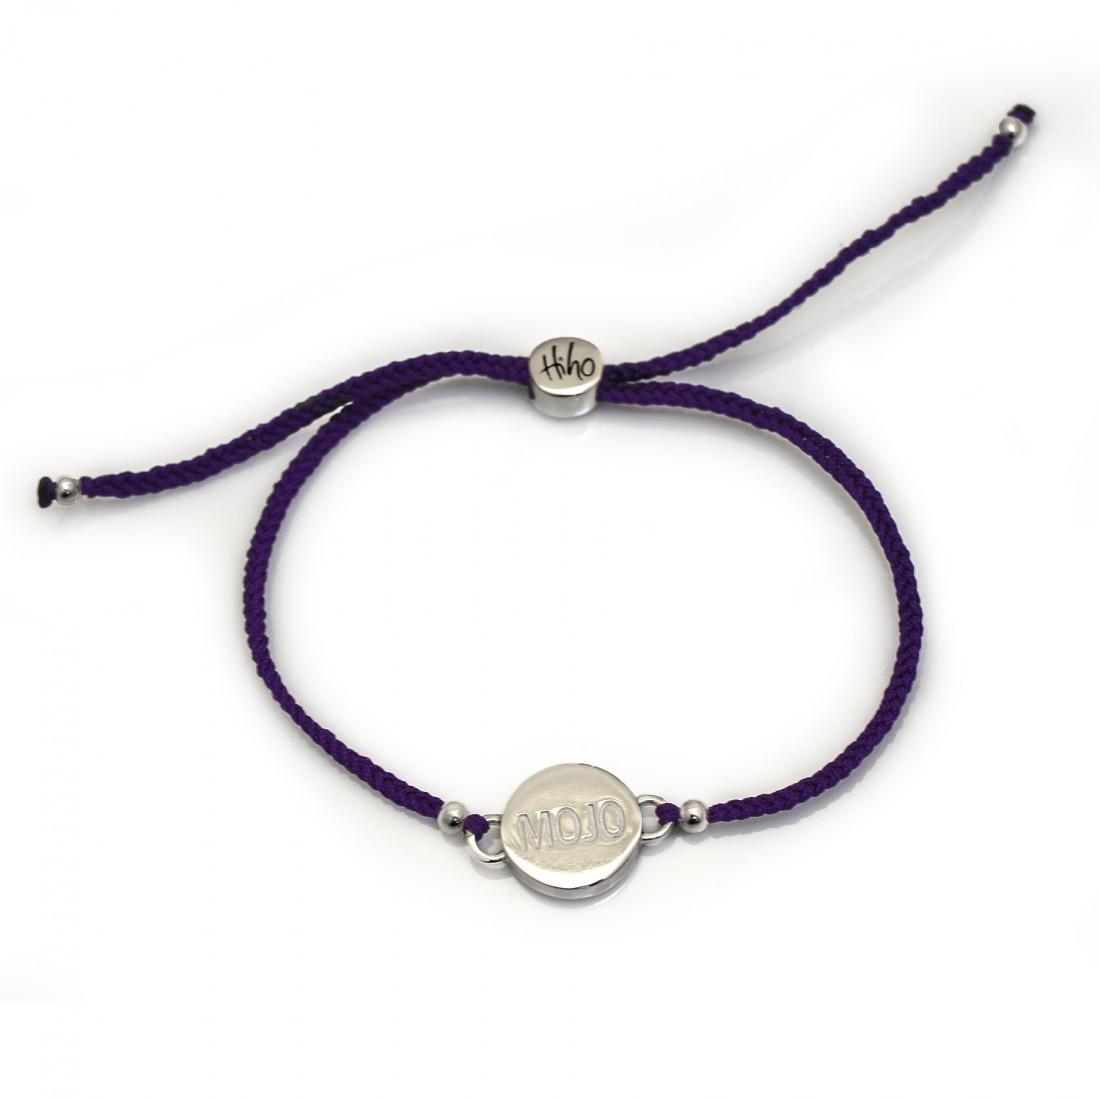 Exclusive Sterling Silver Single Mojo Friendship Bracelet